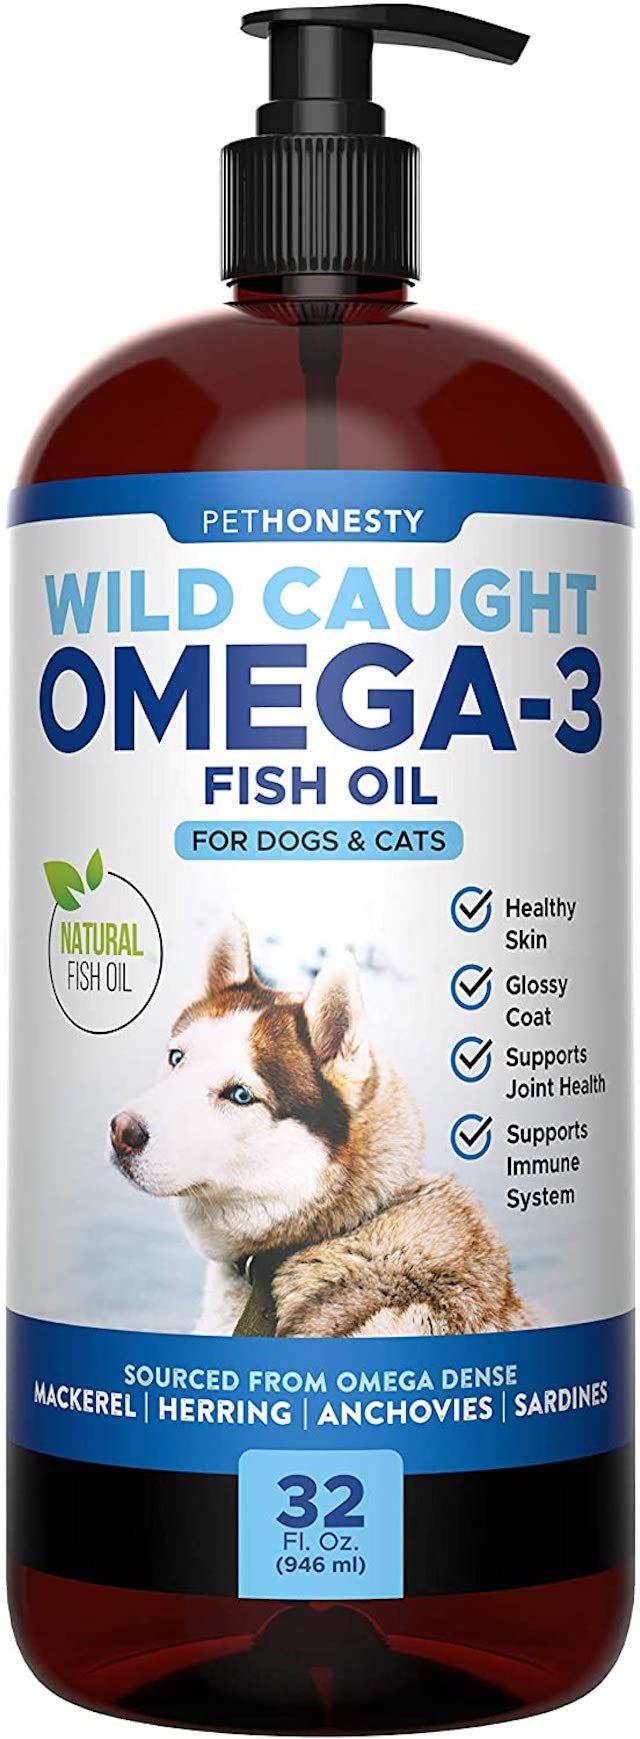 PetHonesty Omega-3 Fish Oil Dog & Cat Supplement